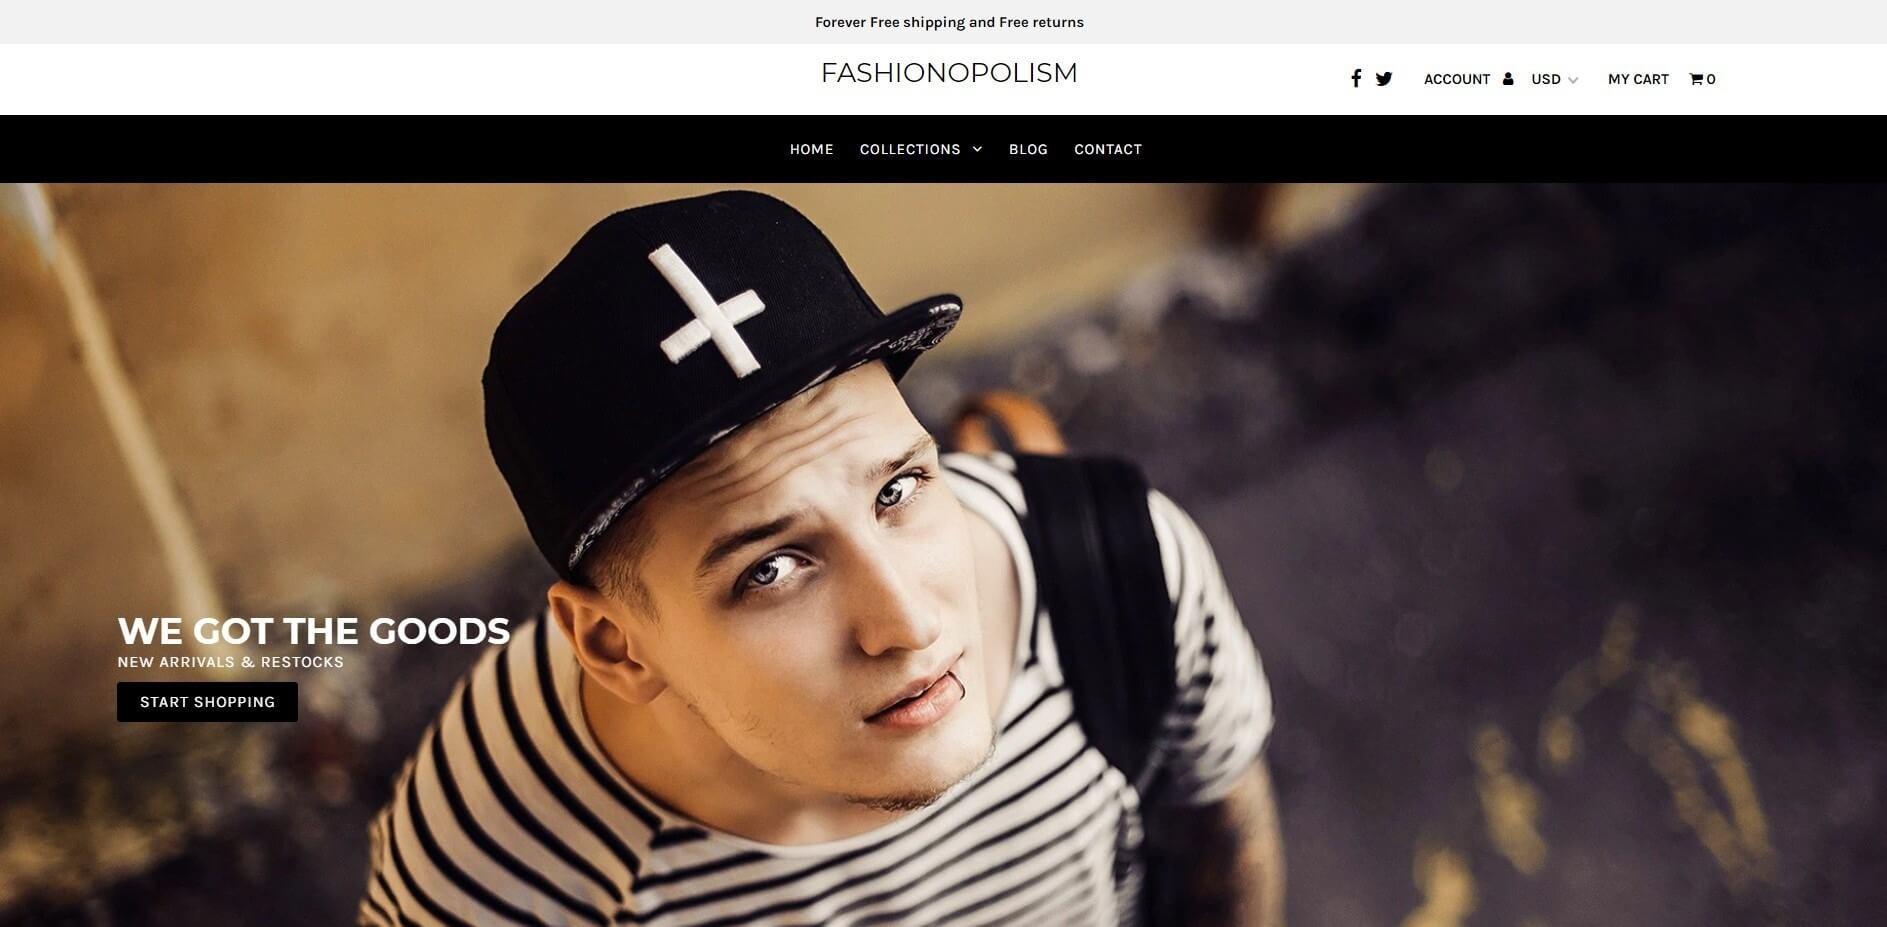 Fashionopolism shopify theme image